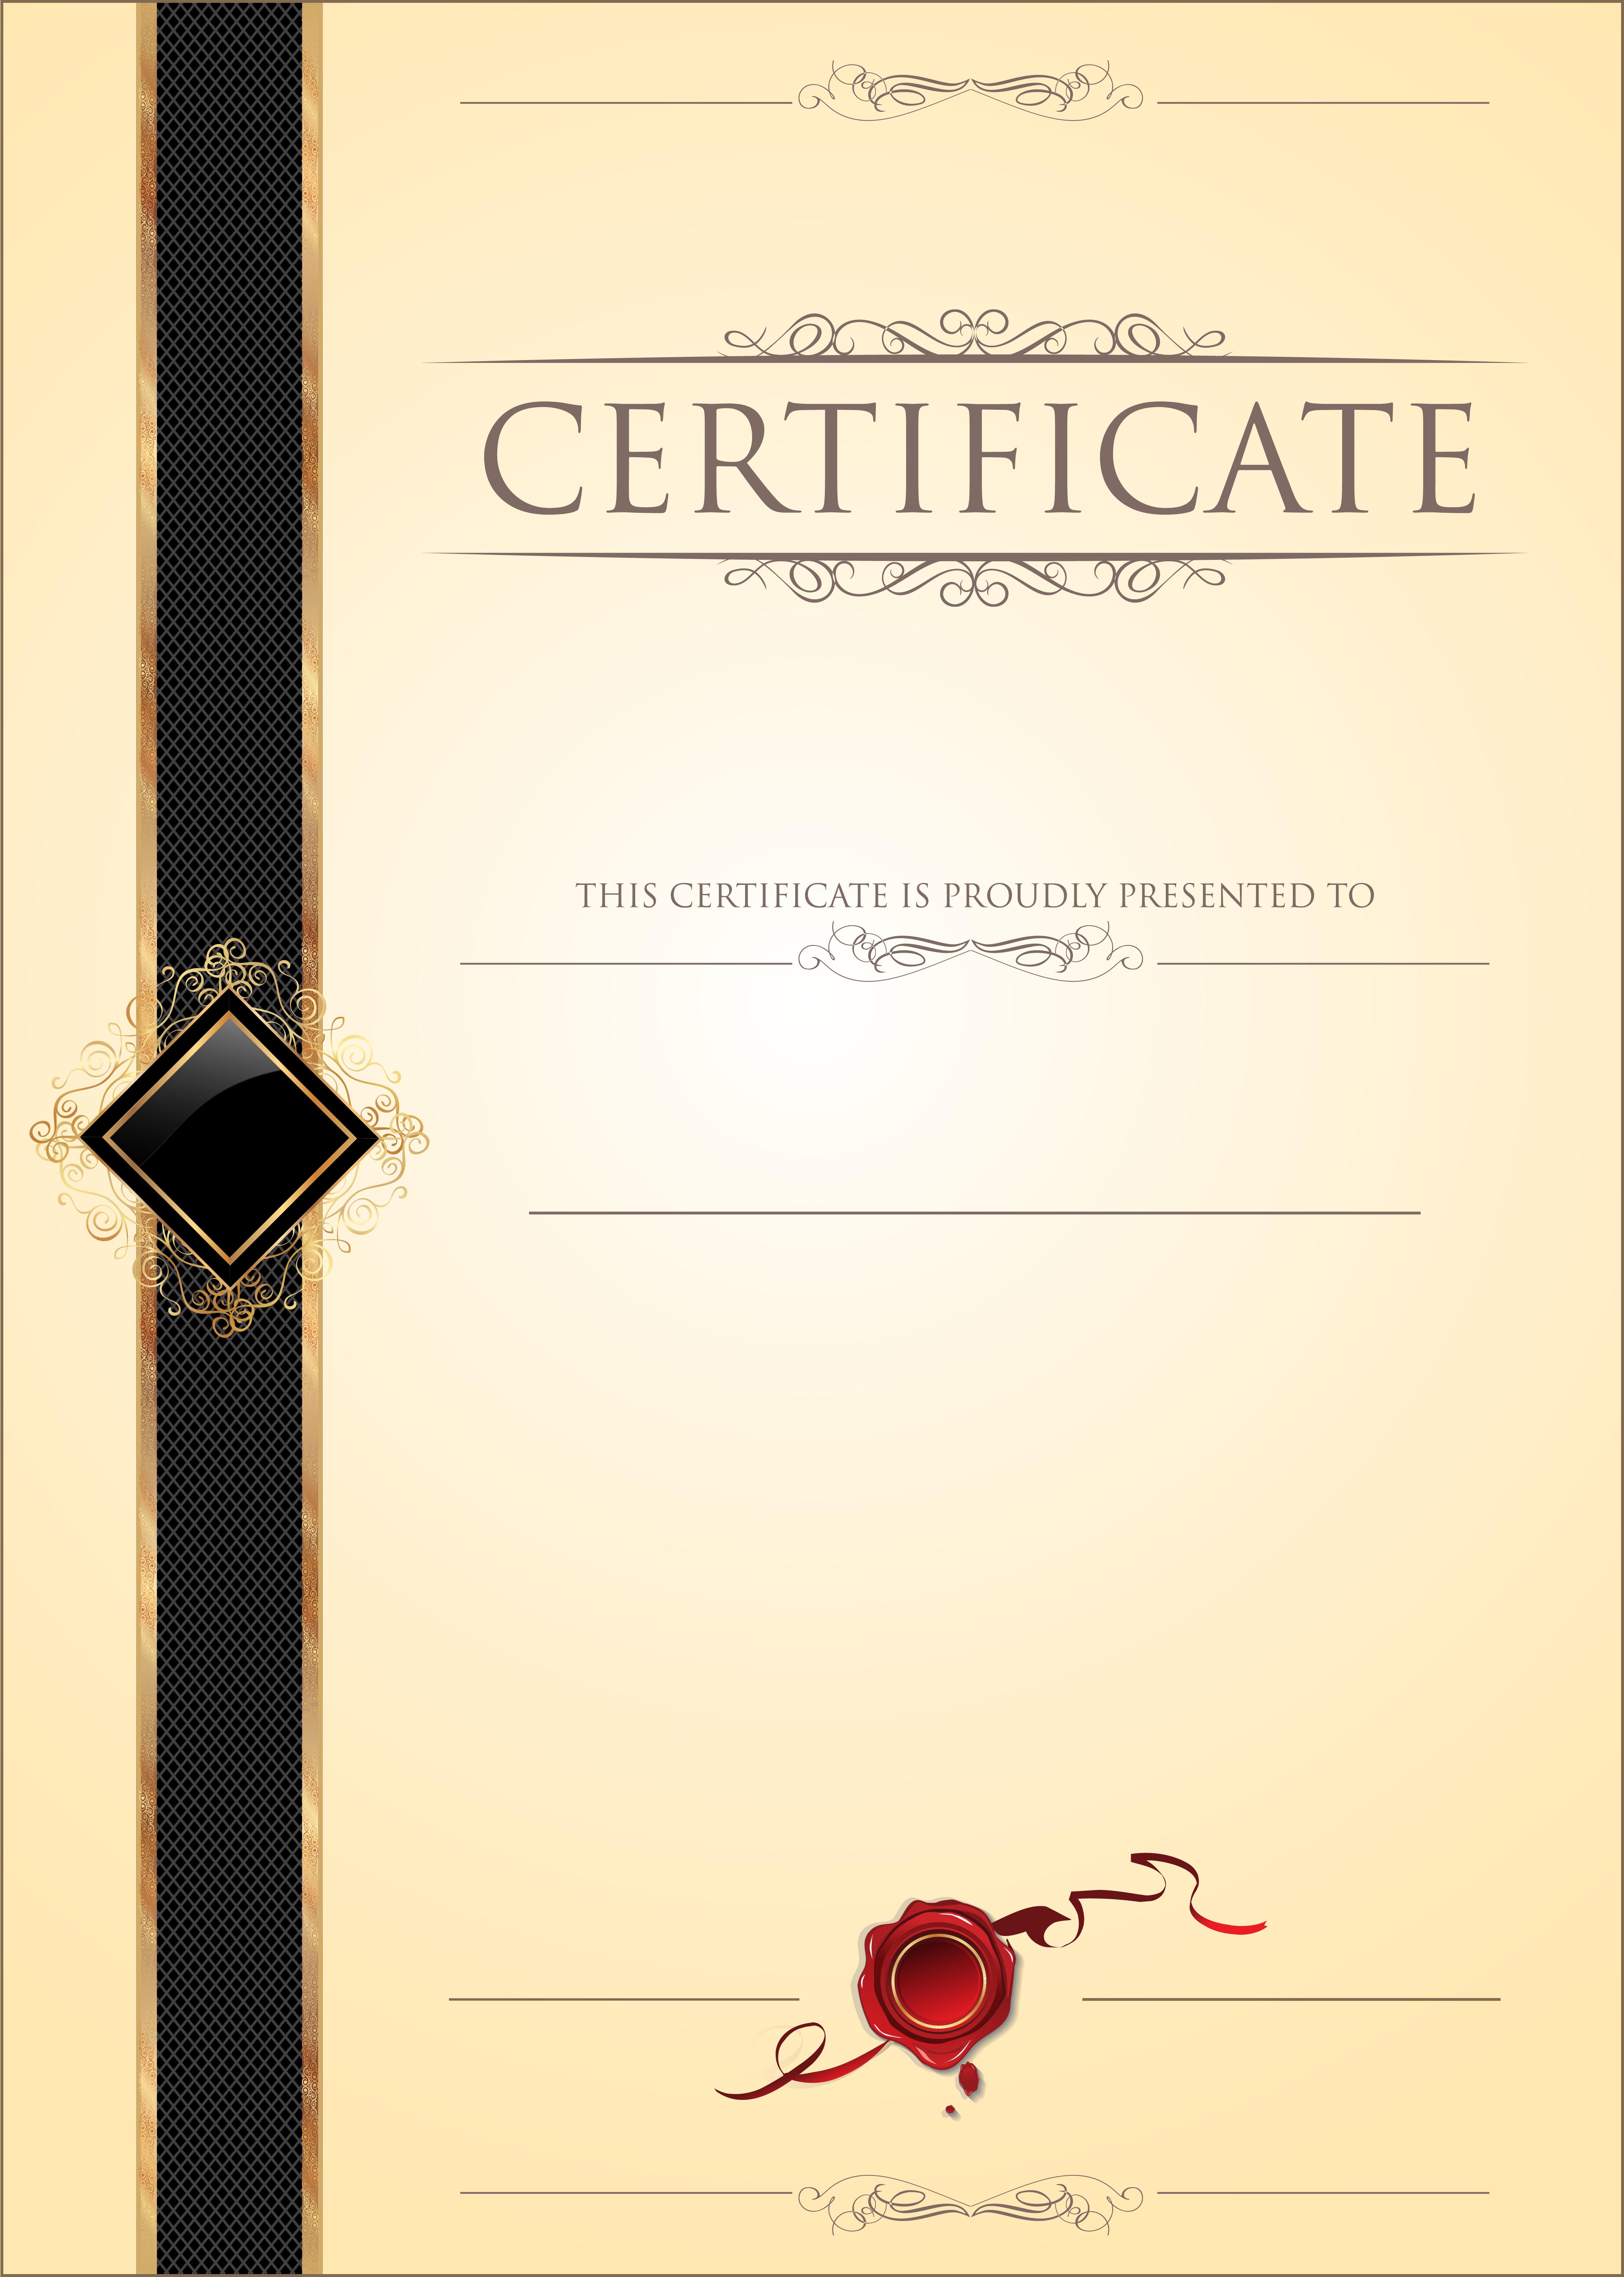 Free funny award certificates templates editable award of free funny award certificates templates editable award of excellence cookie pinterest certificate template and free 1betcityfo Images